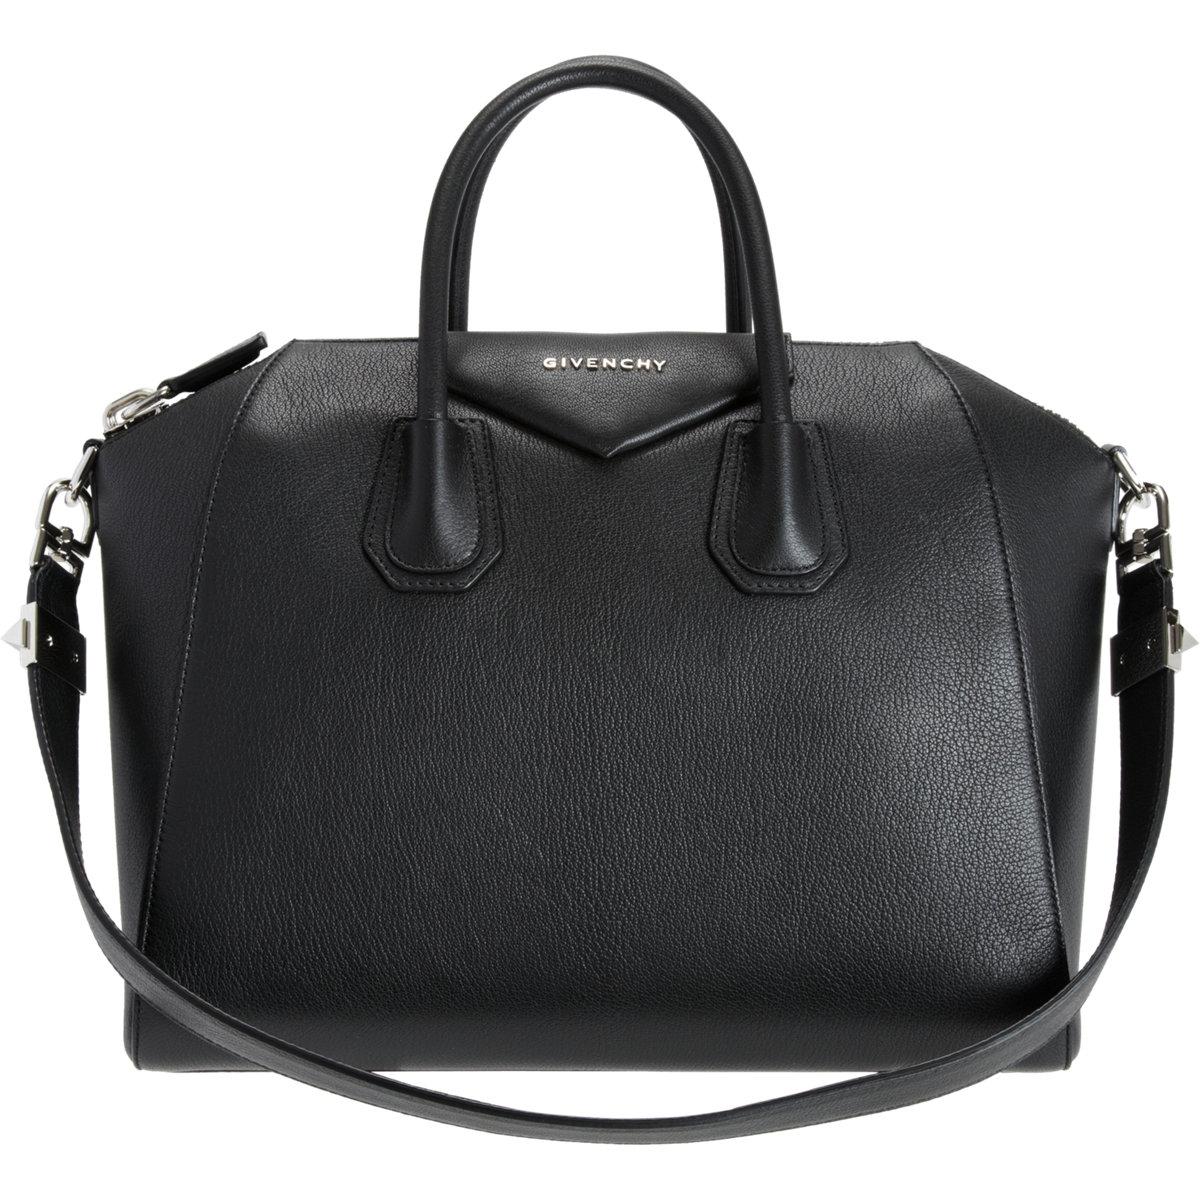 Givenchy Medium Antigona Duffel at Barneys.com